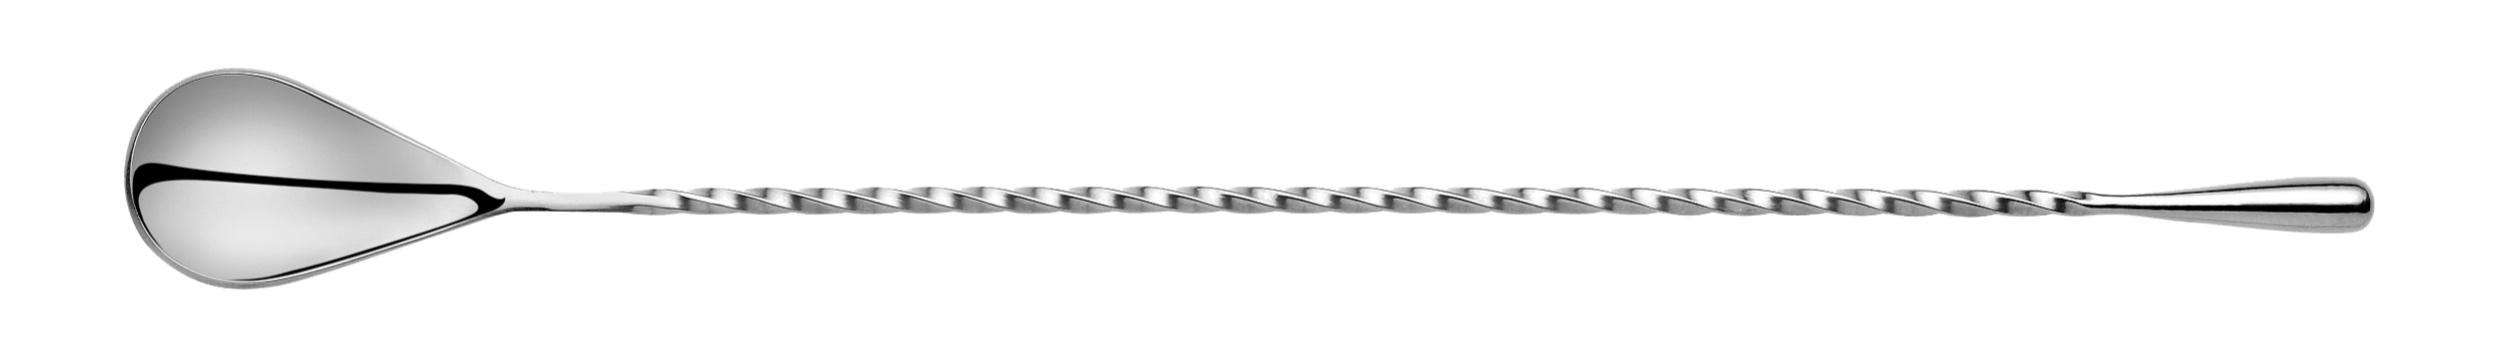 ub4041-teardrop-bar-spoon-300mm-v270.jpg